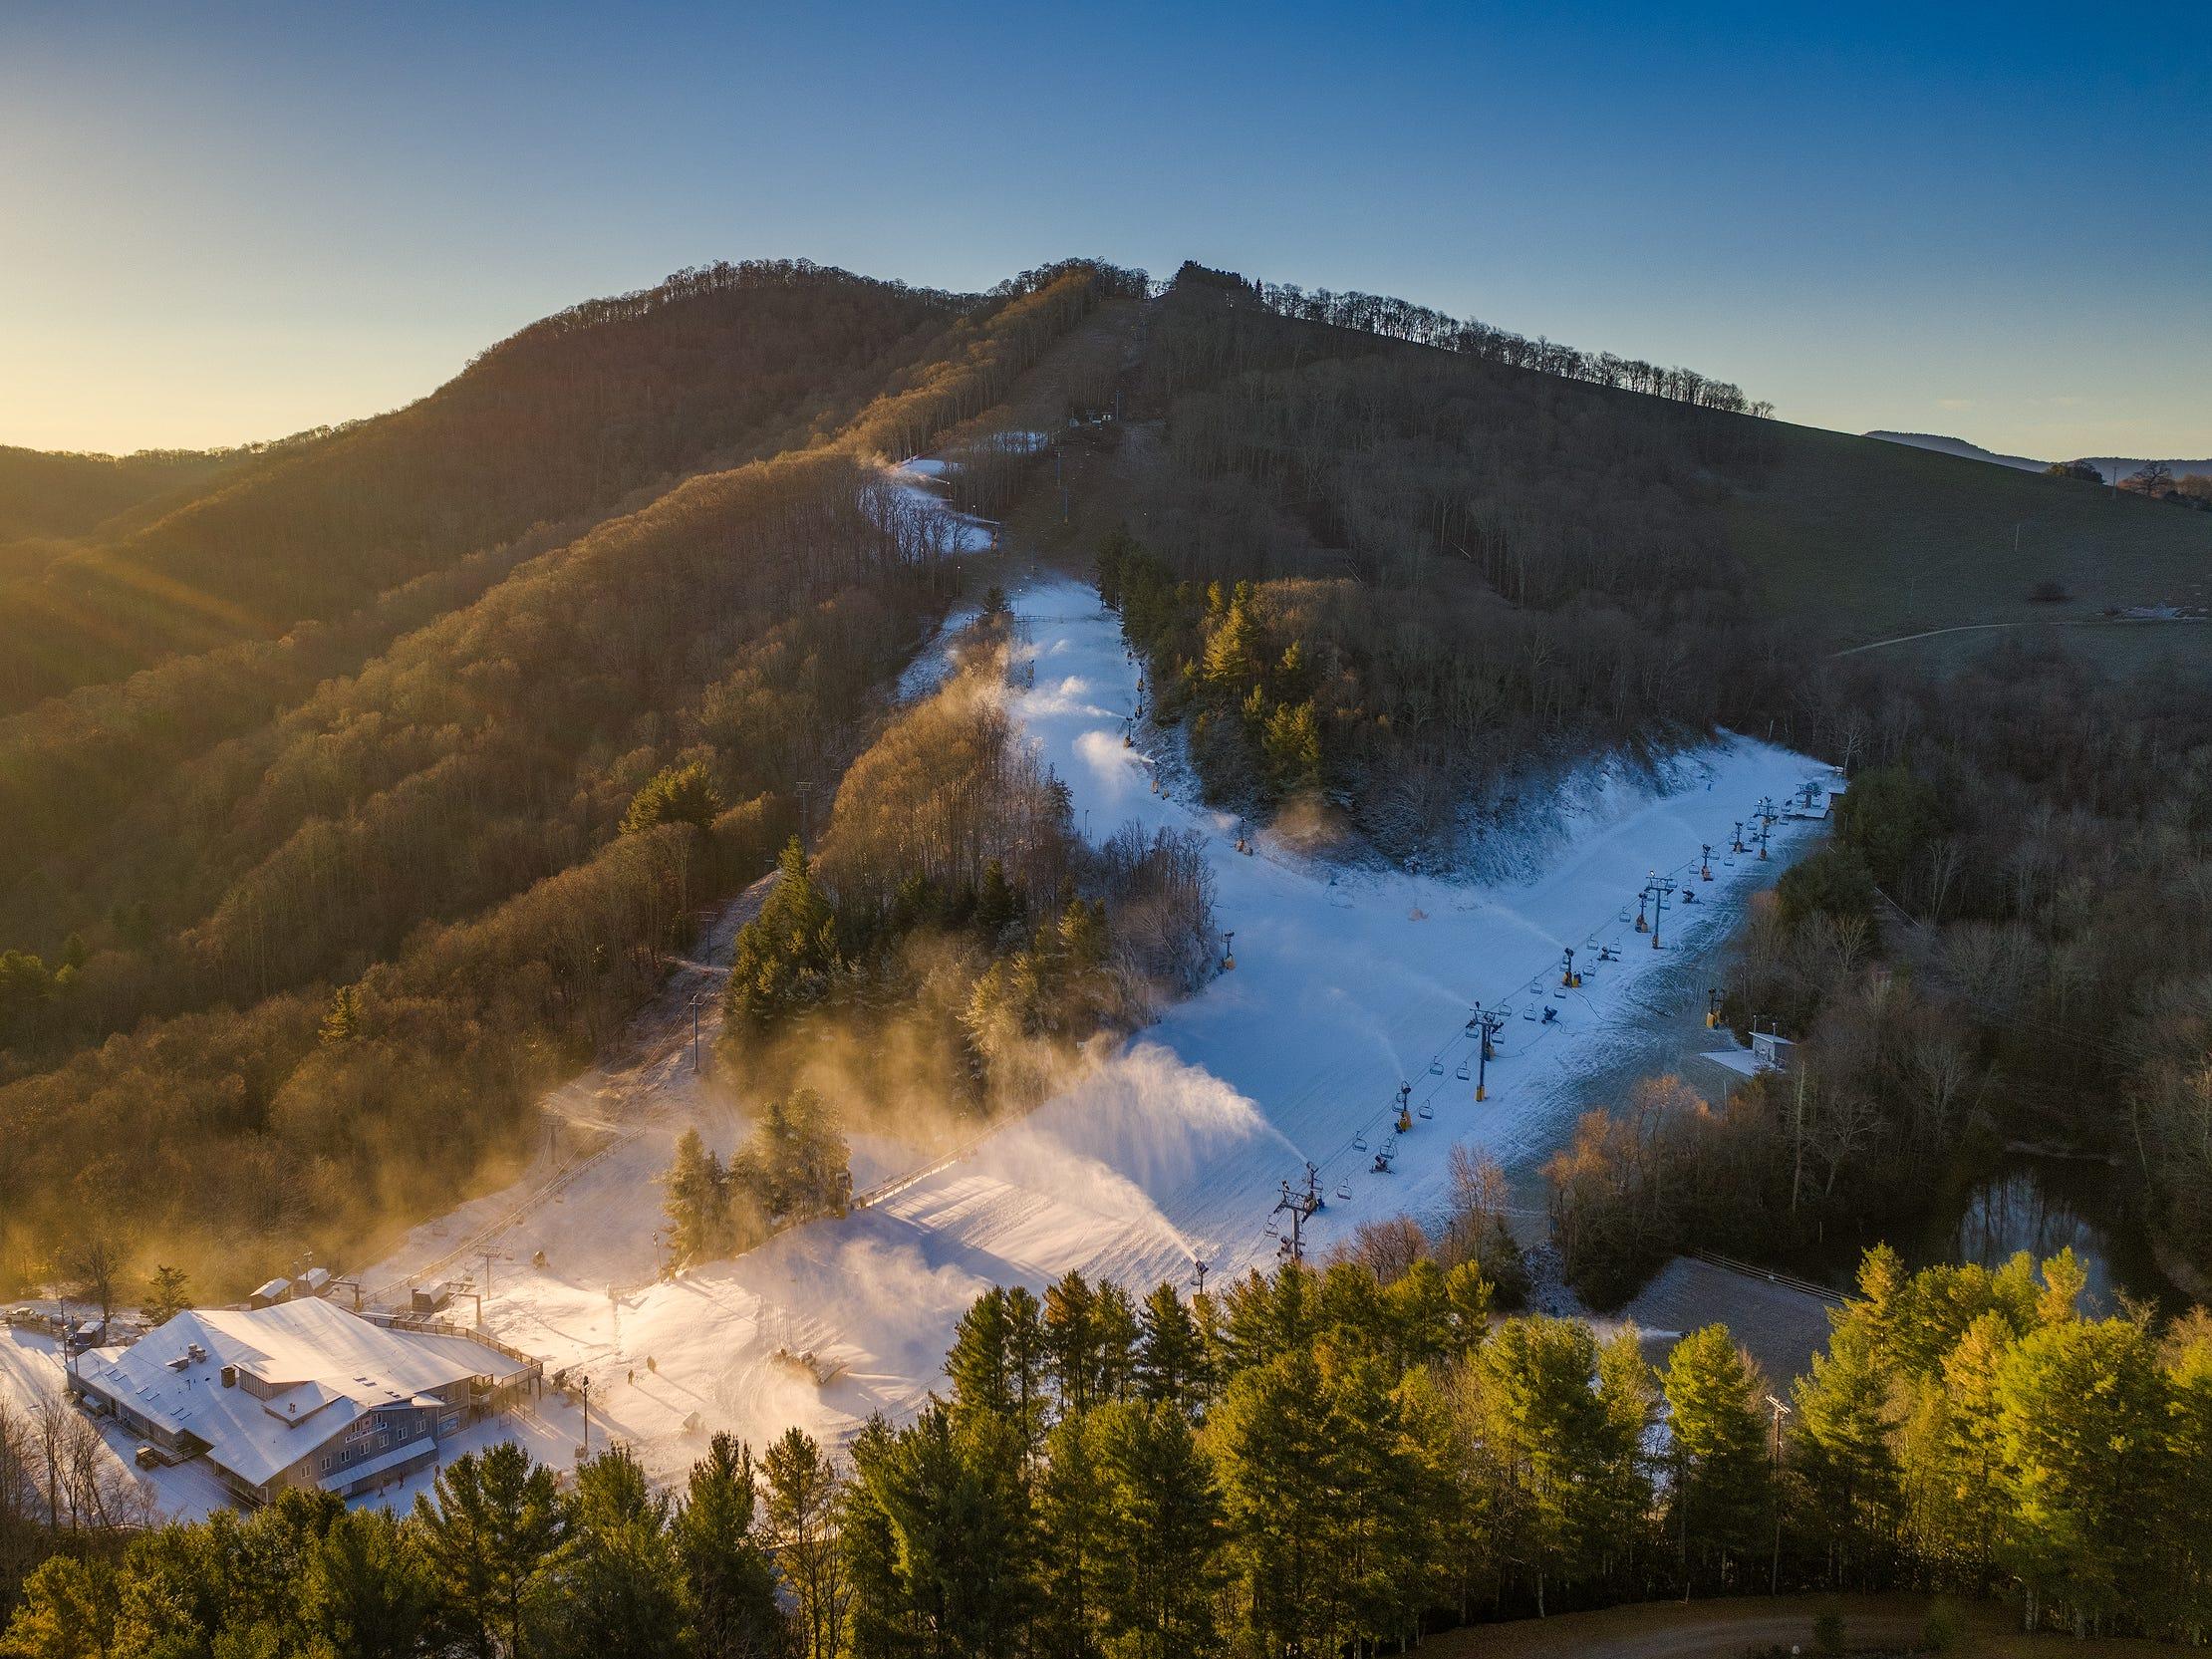 Western North Carolina ski areas struggle to open due to persistent rain